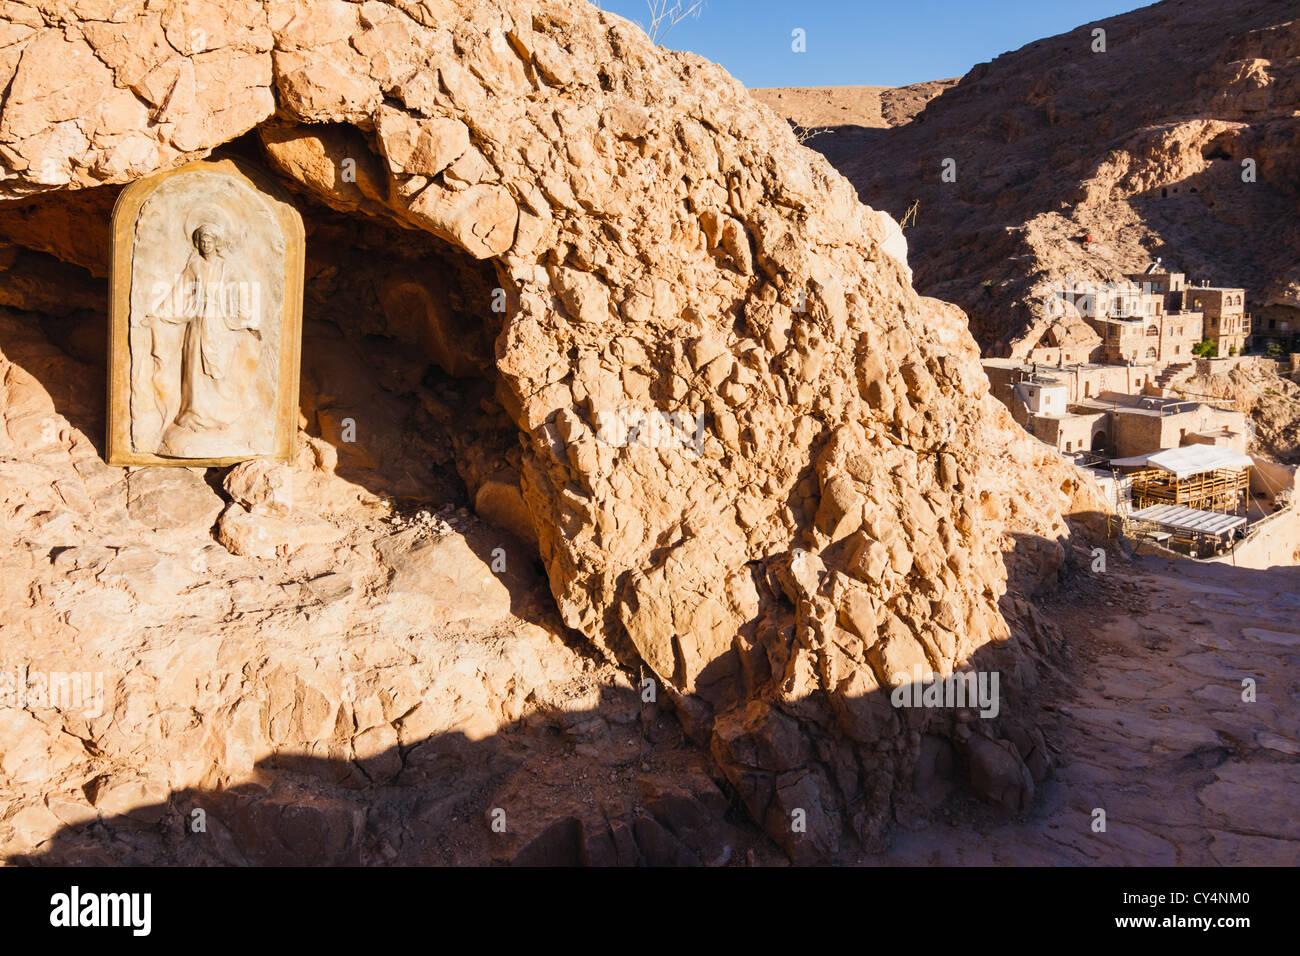 Mar Musa Monastery. Near Nebek, Syria - Stock Image